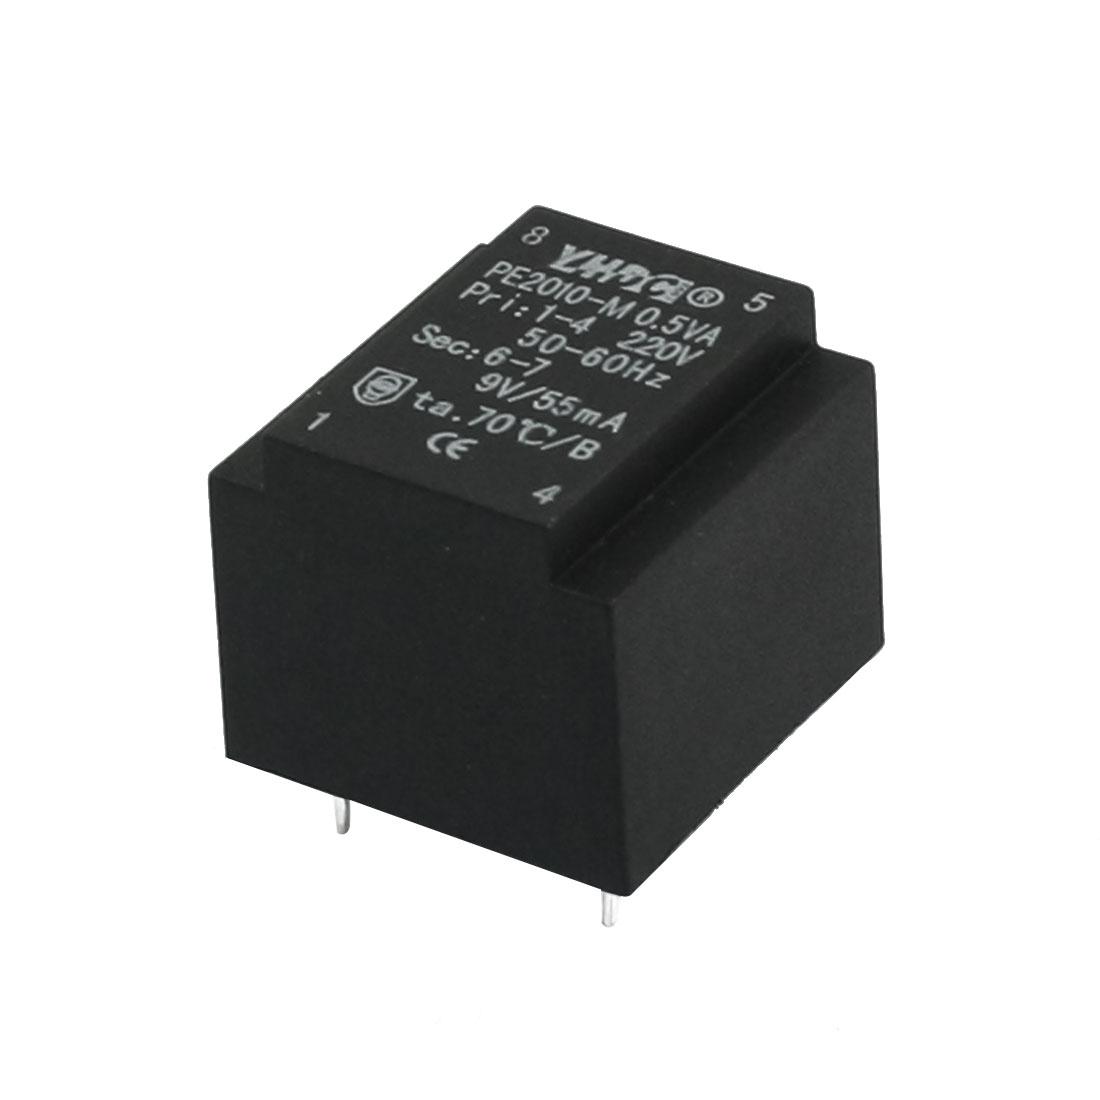 AC 220V to 9V 50-60HZ 55mA 4-pin Microwave Oven Power Transformer